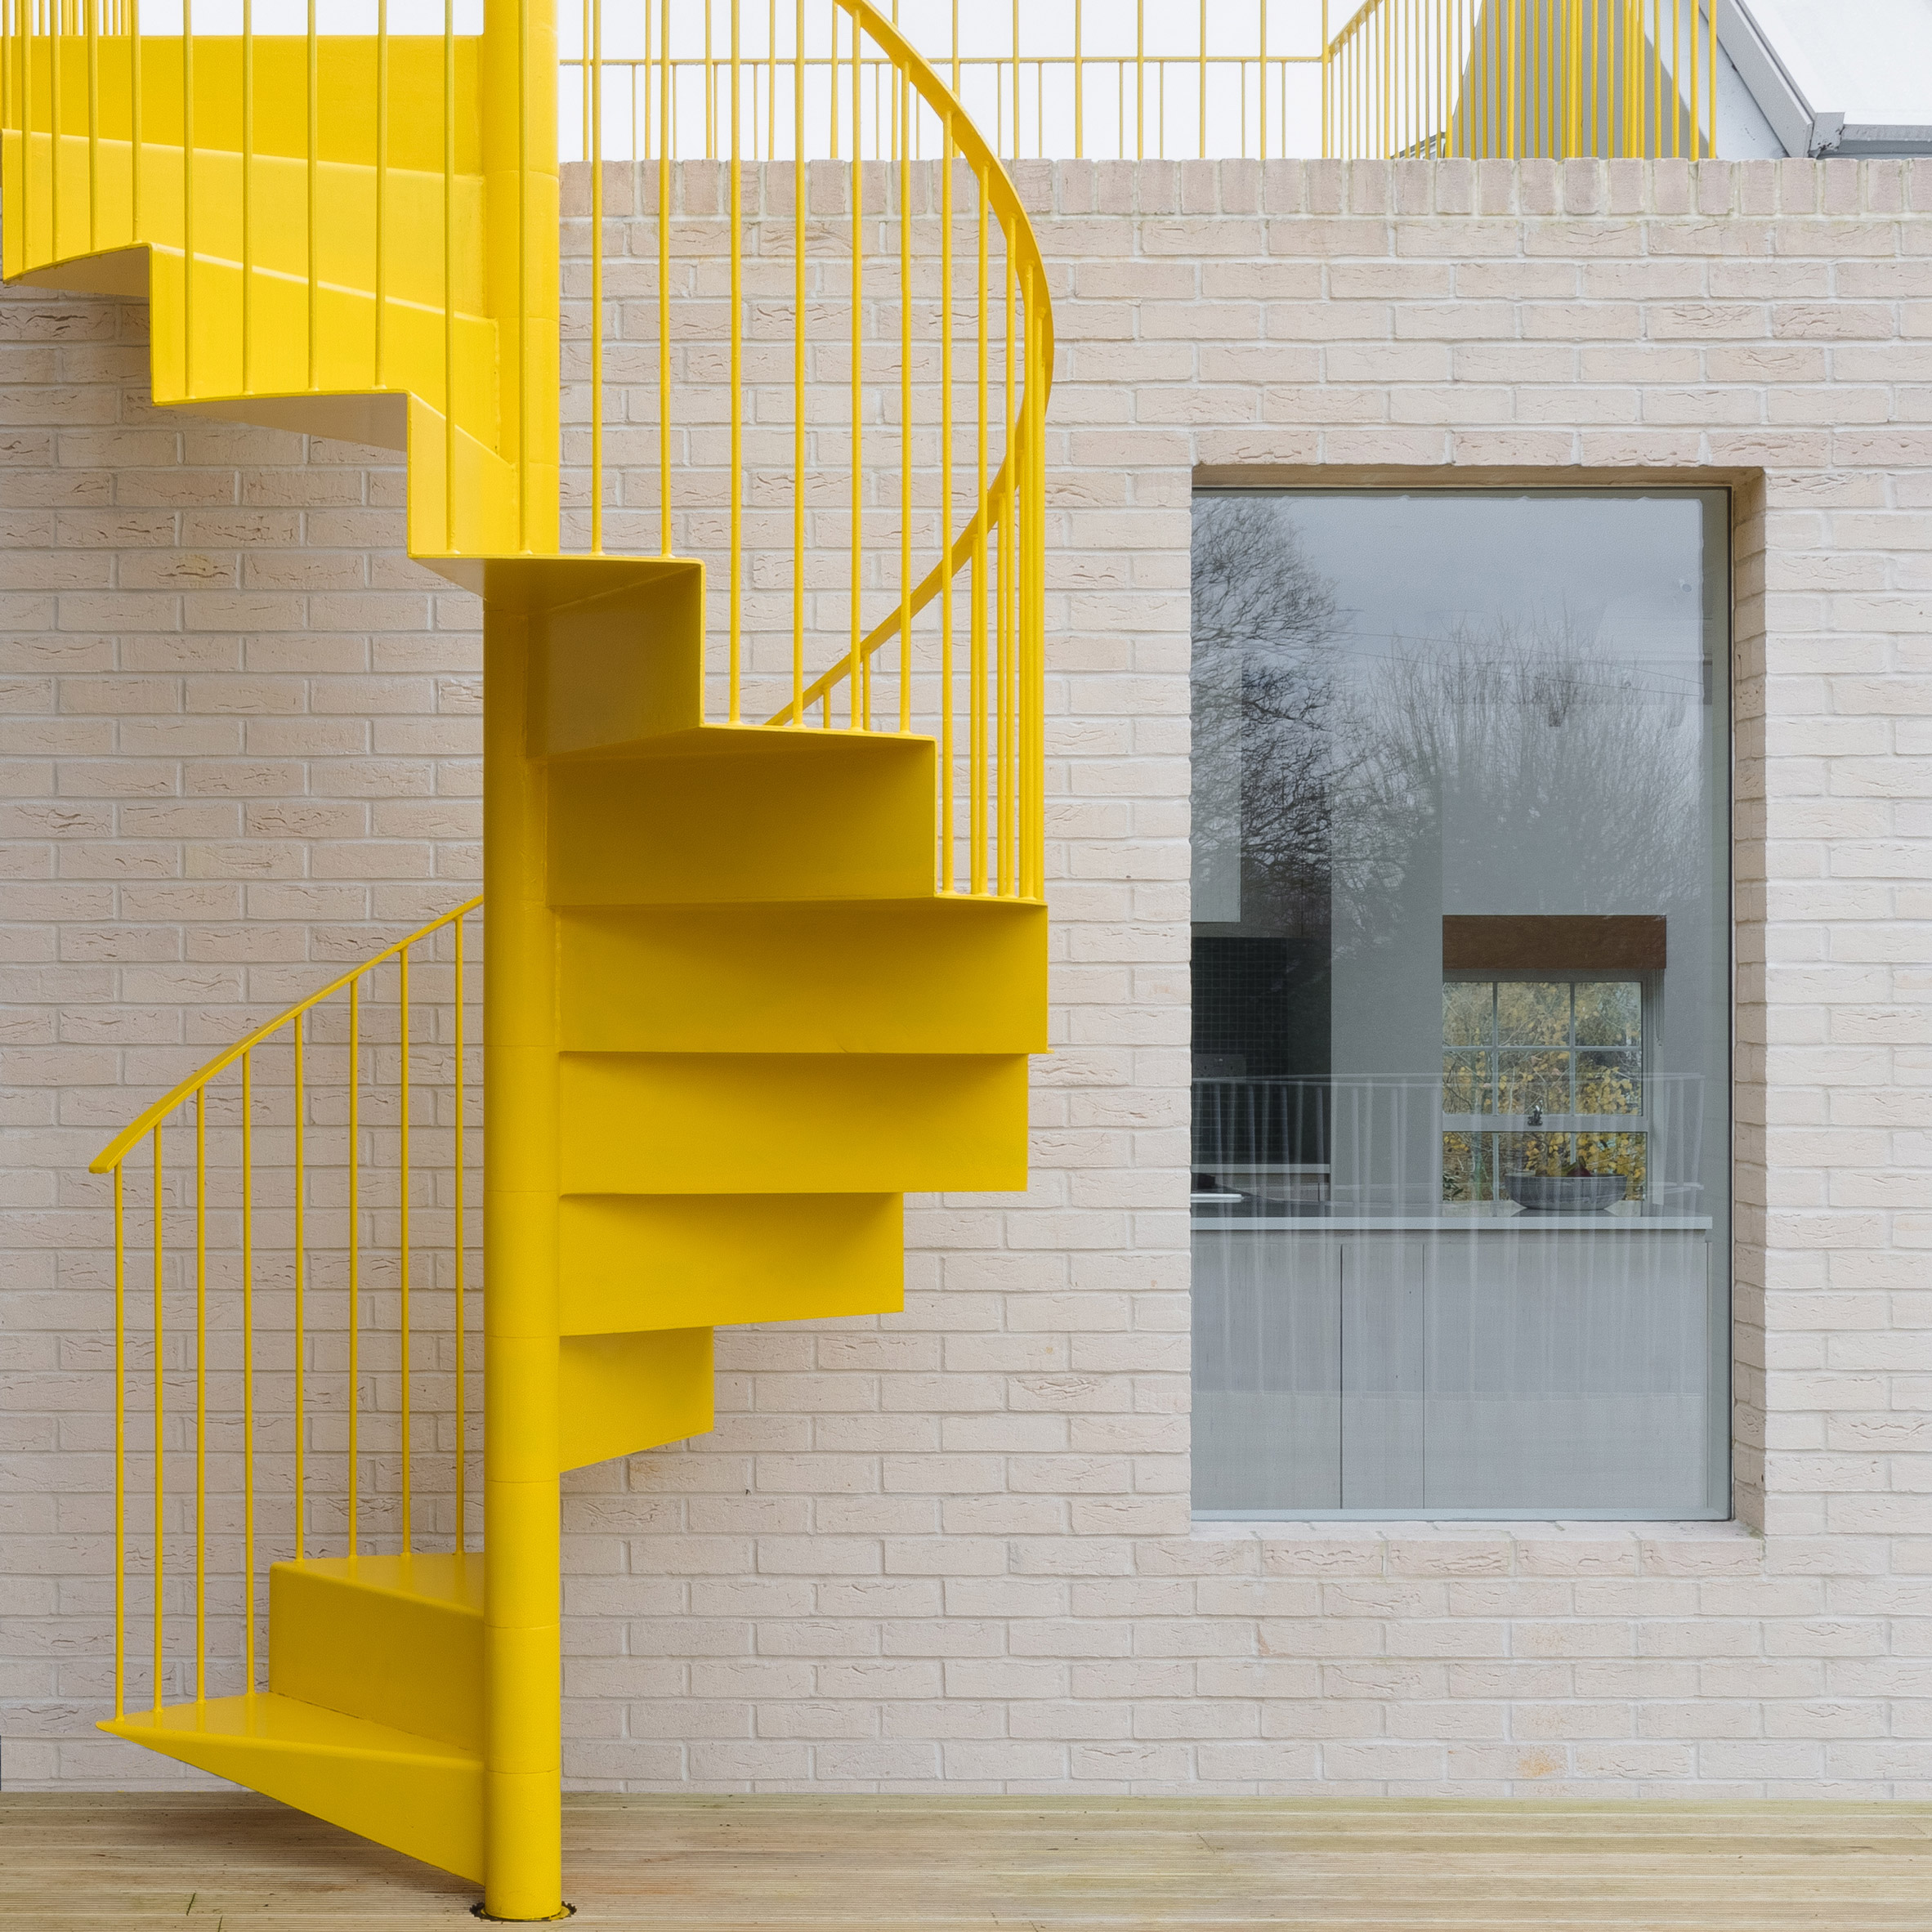 Mile End Road, UK, Vine Architecture Studio